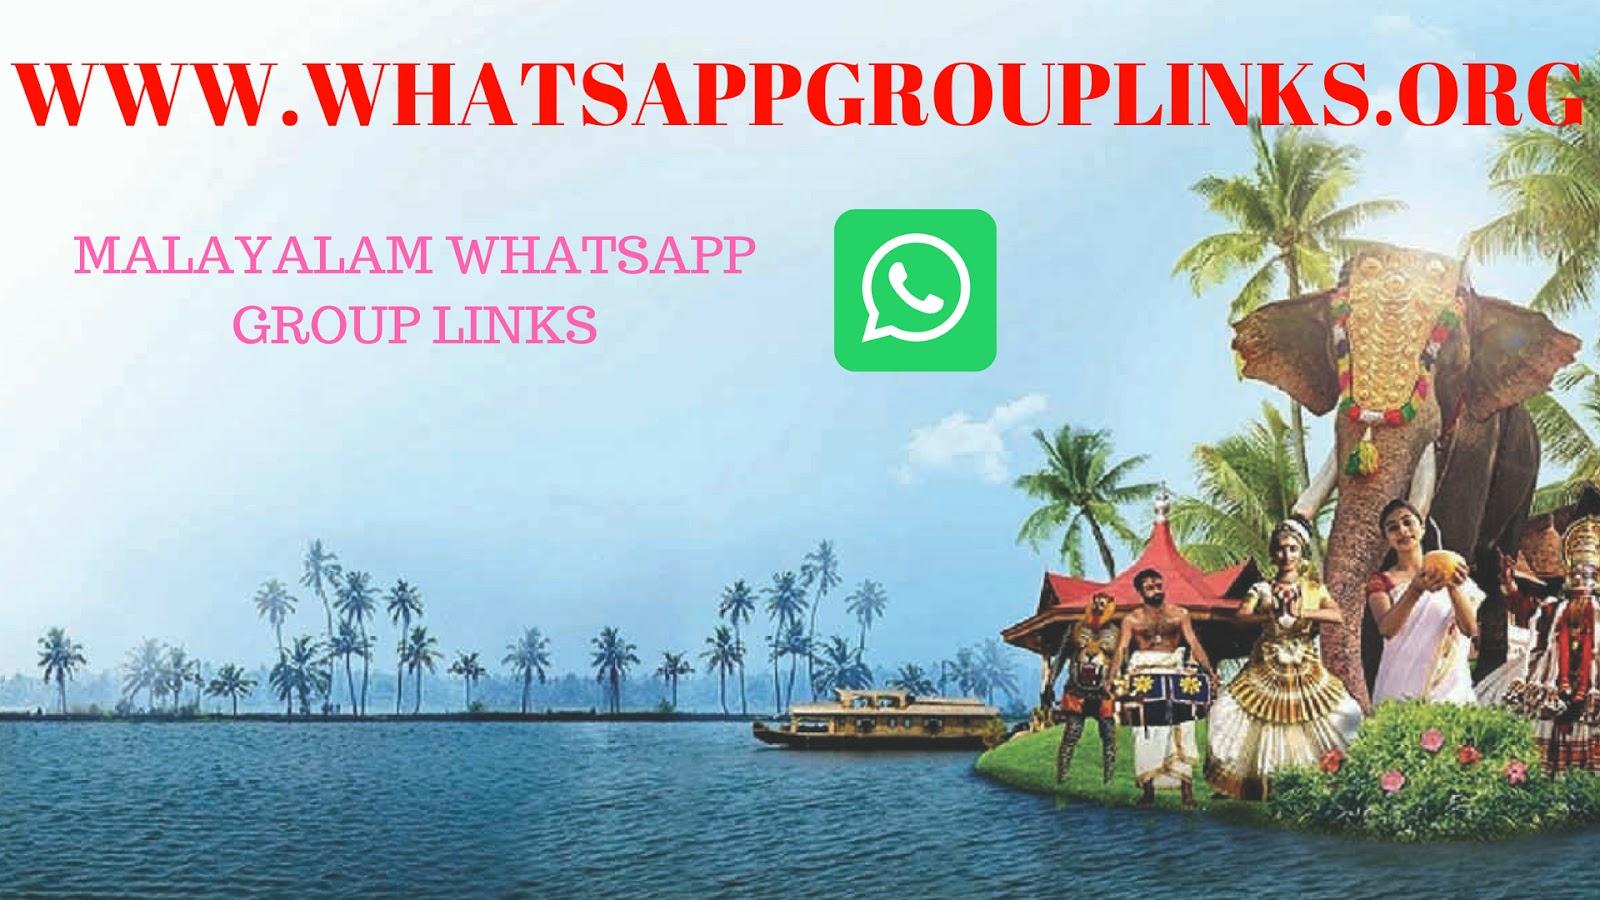 join Malayalam WhatsApp group links list - Whatsapp Group Links